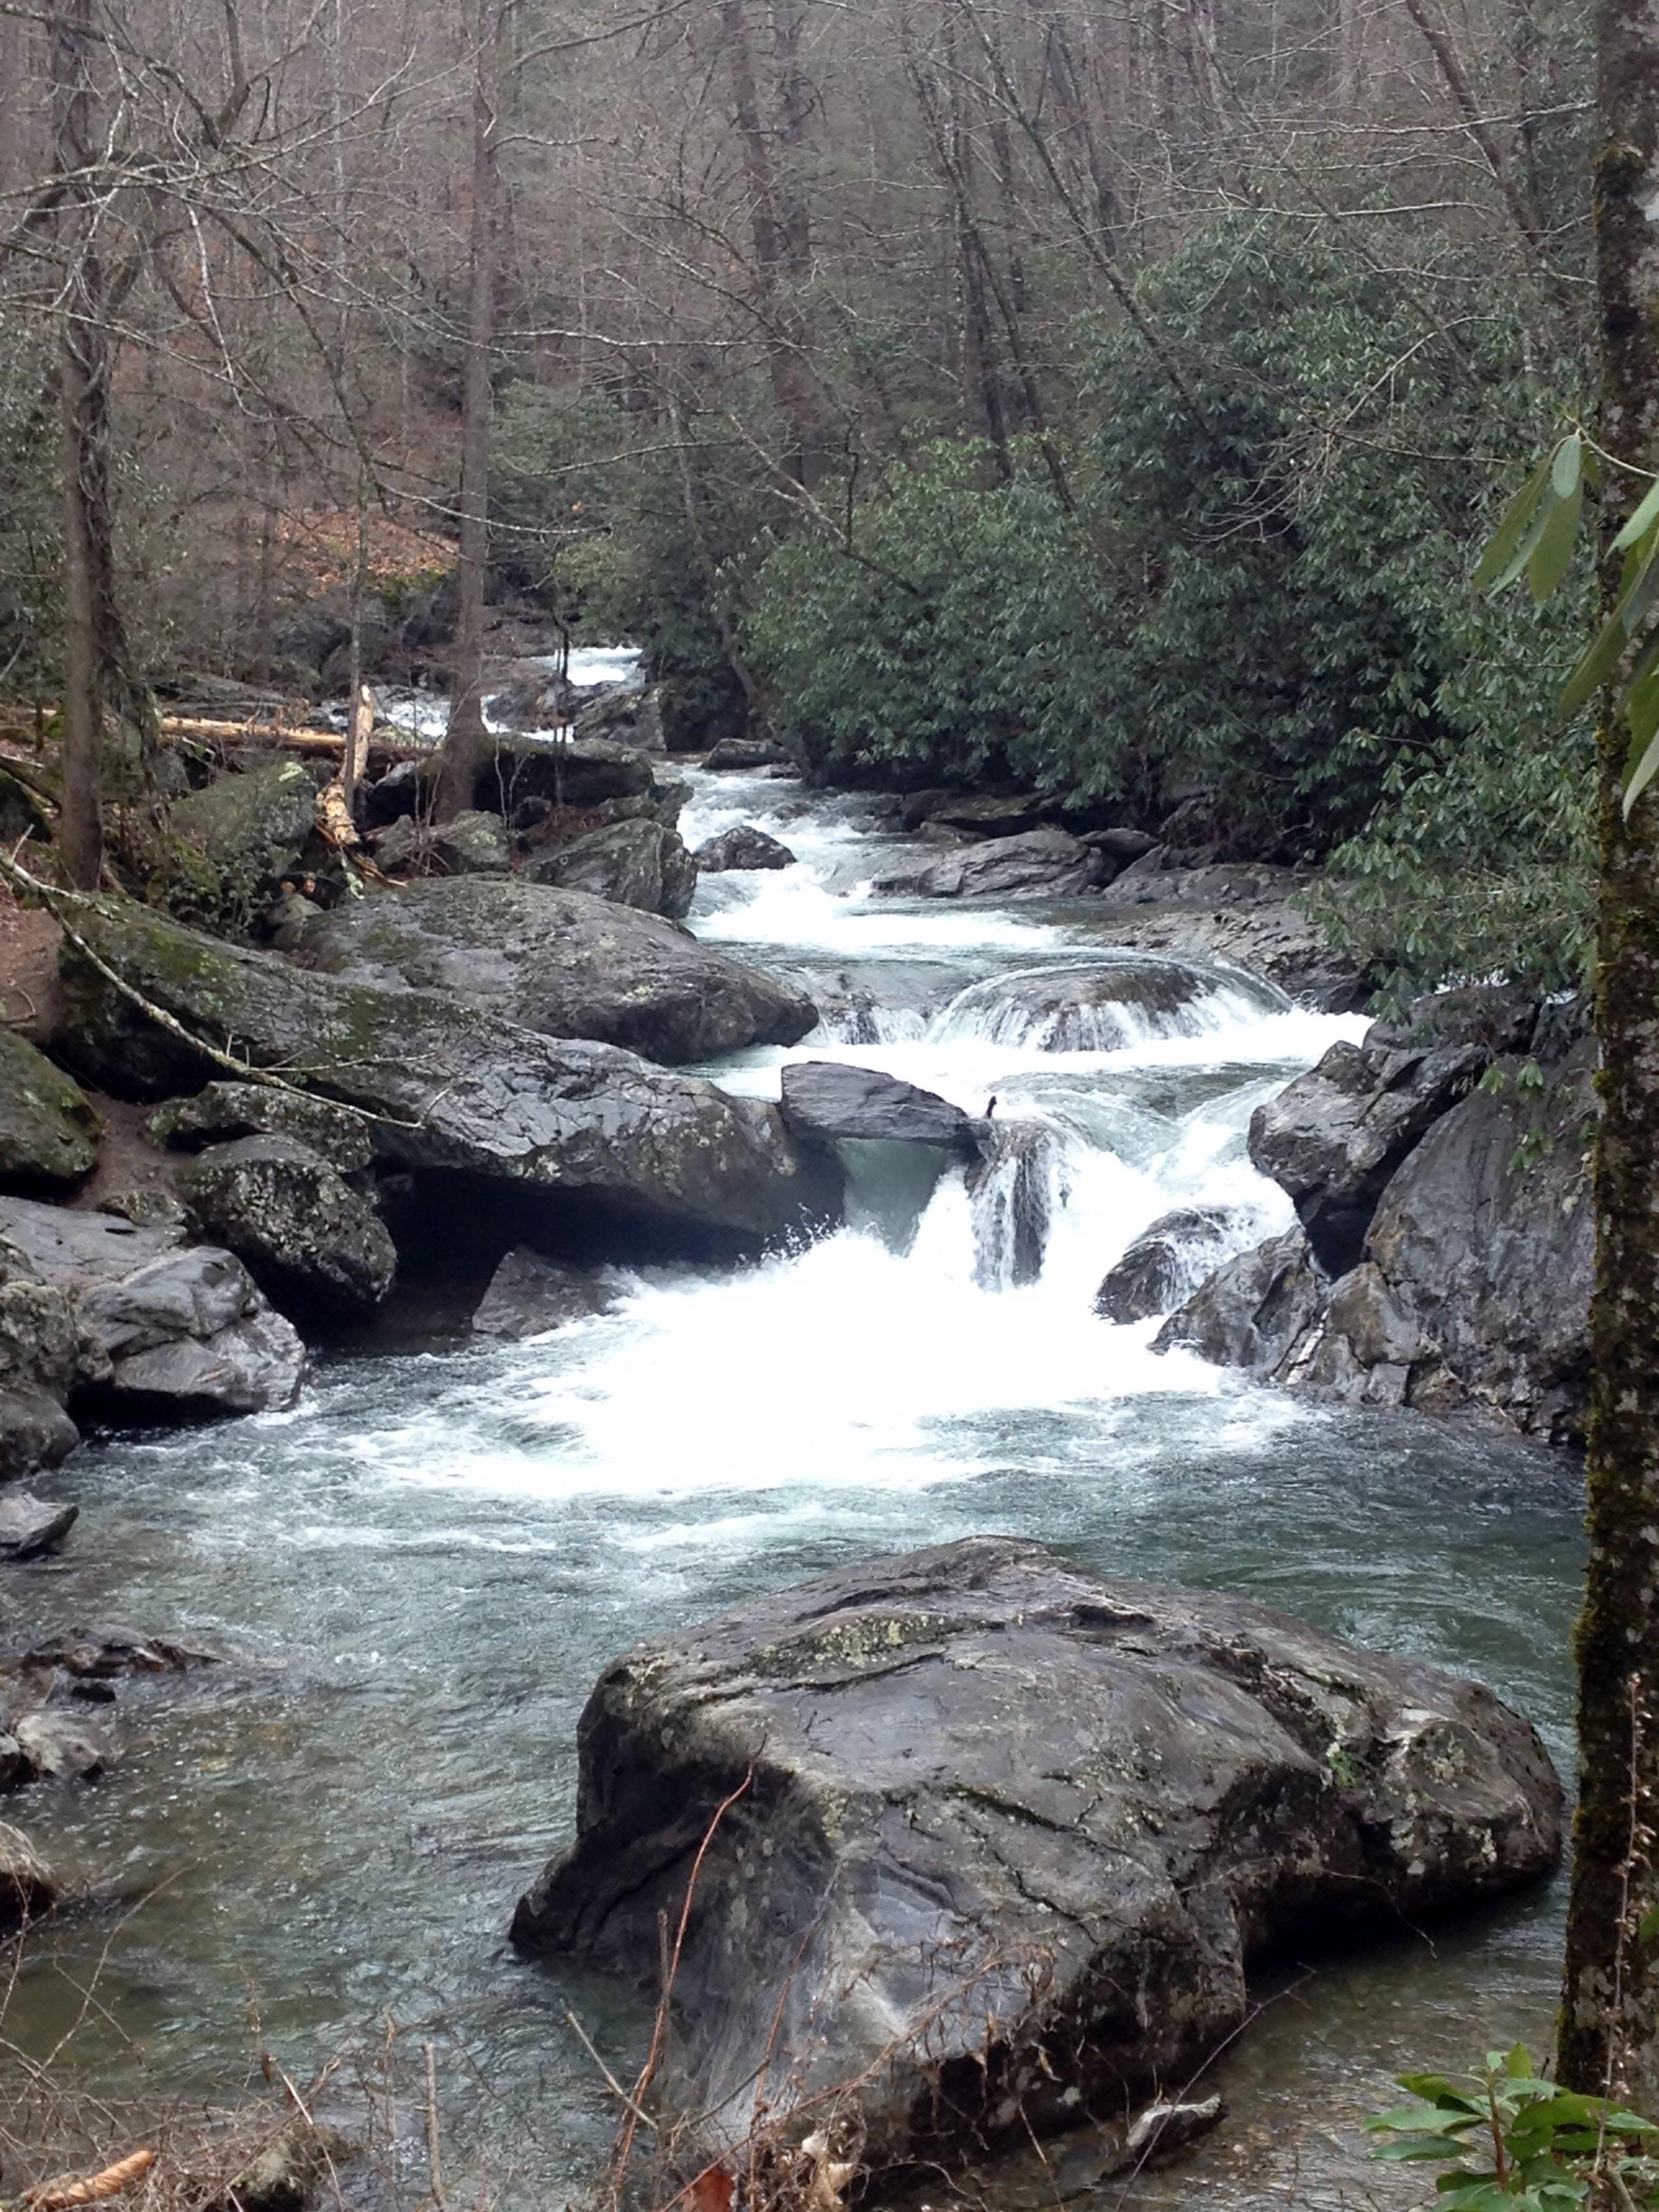 Flowing river over dark rocks